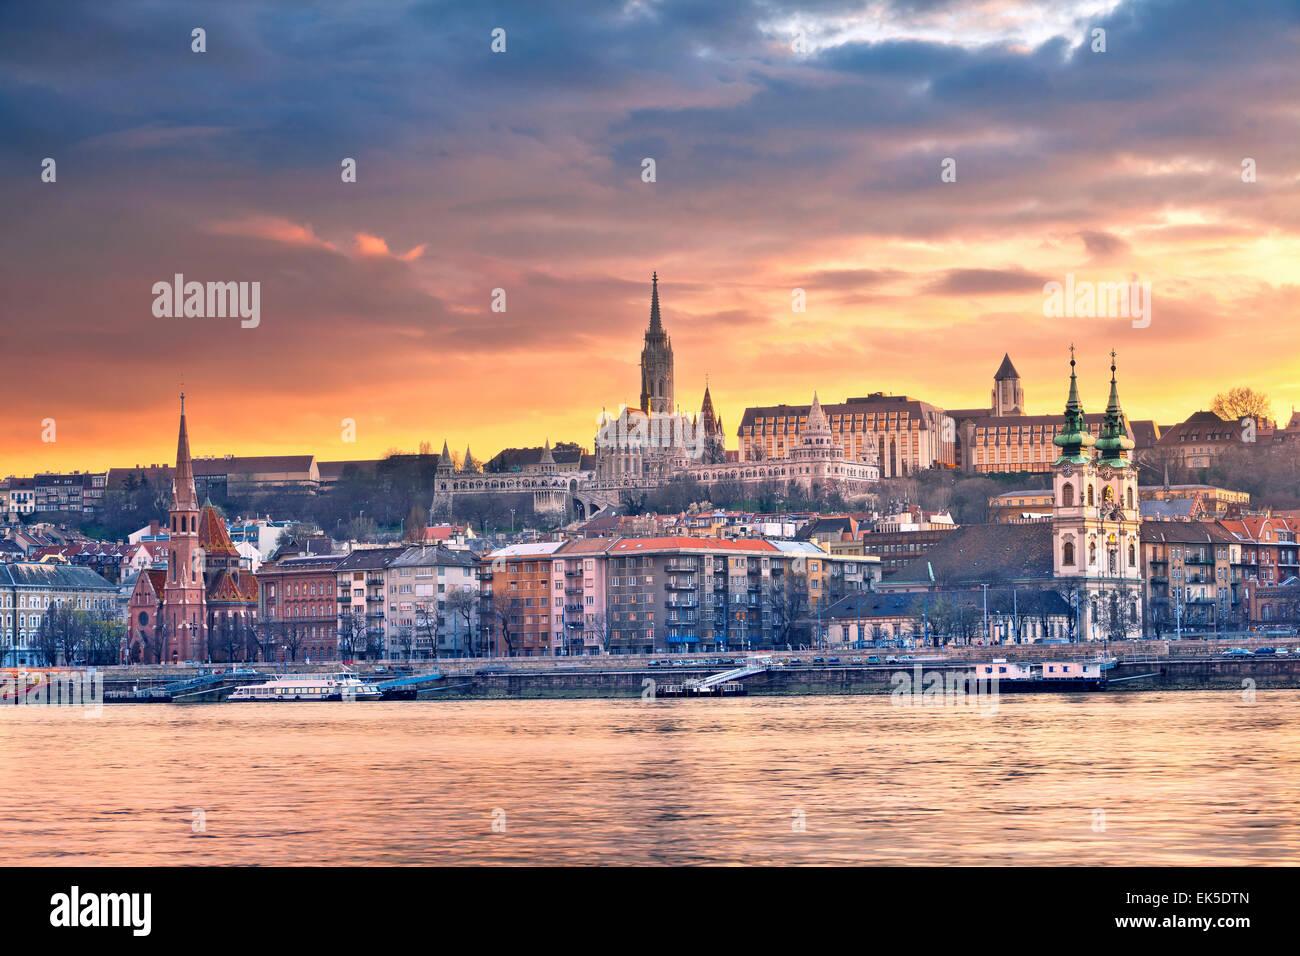 Budapest. Bild von Budapest Skyline bei Sonnenuntergang Frühling. Stockbild